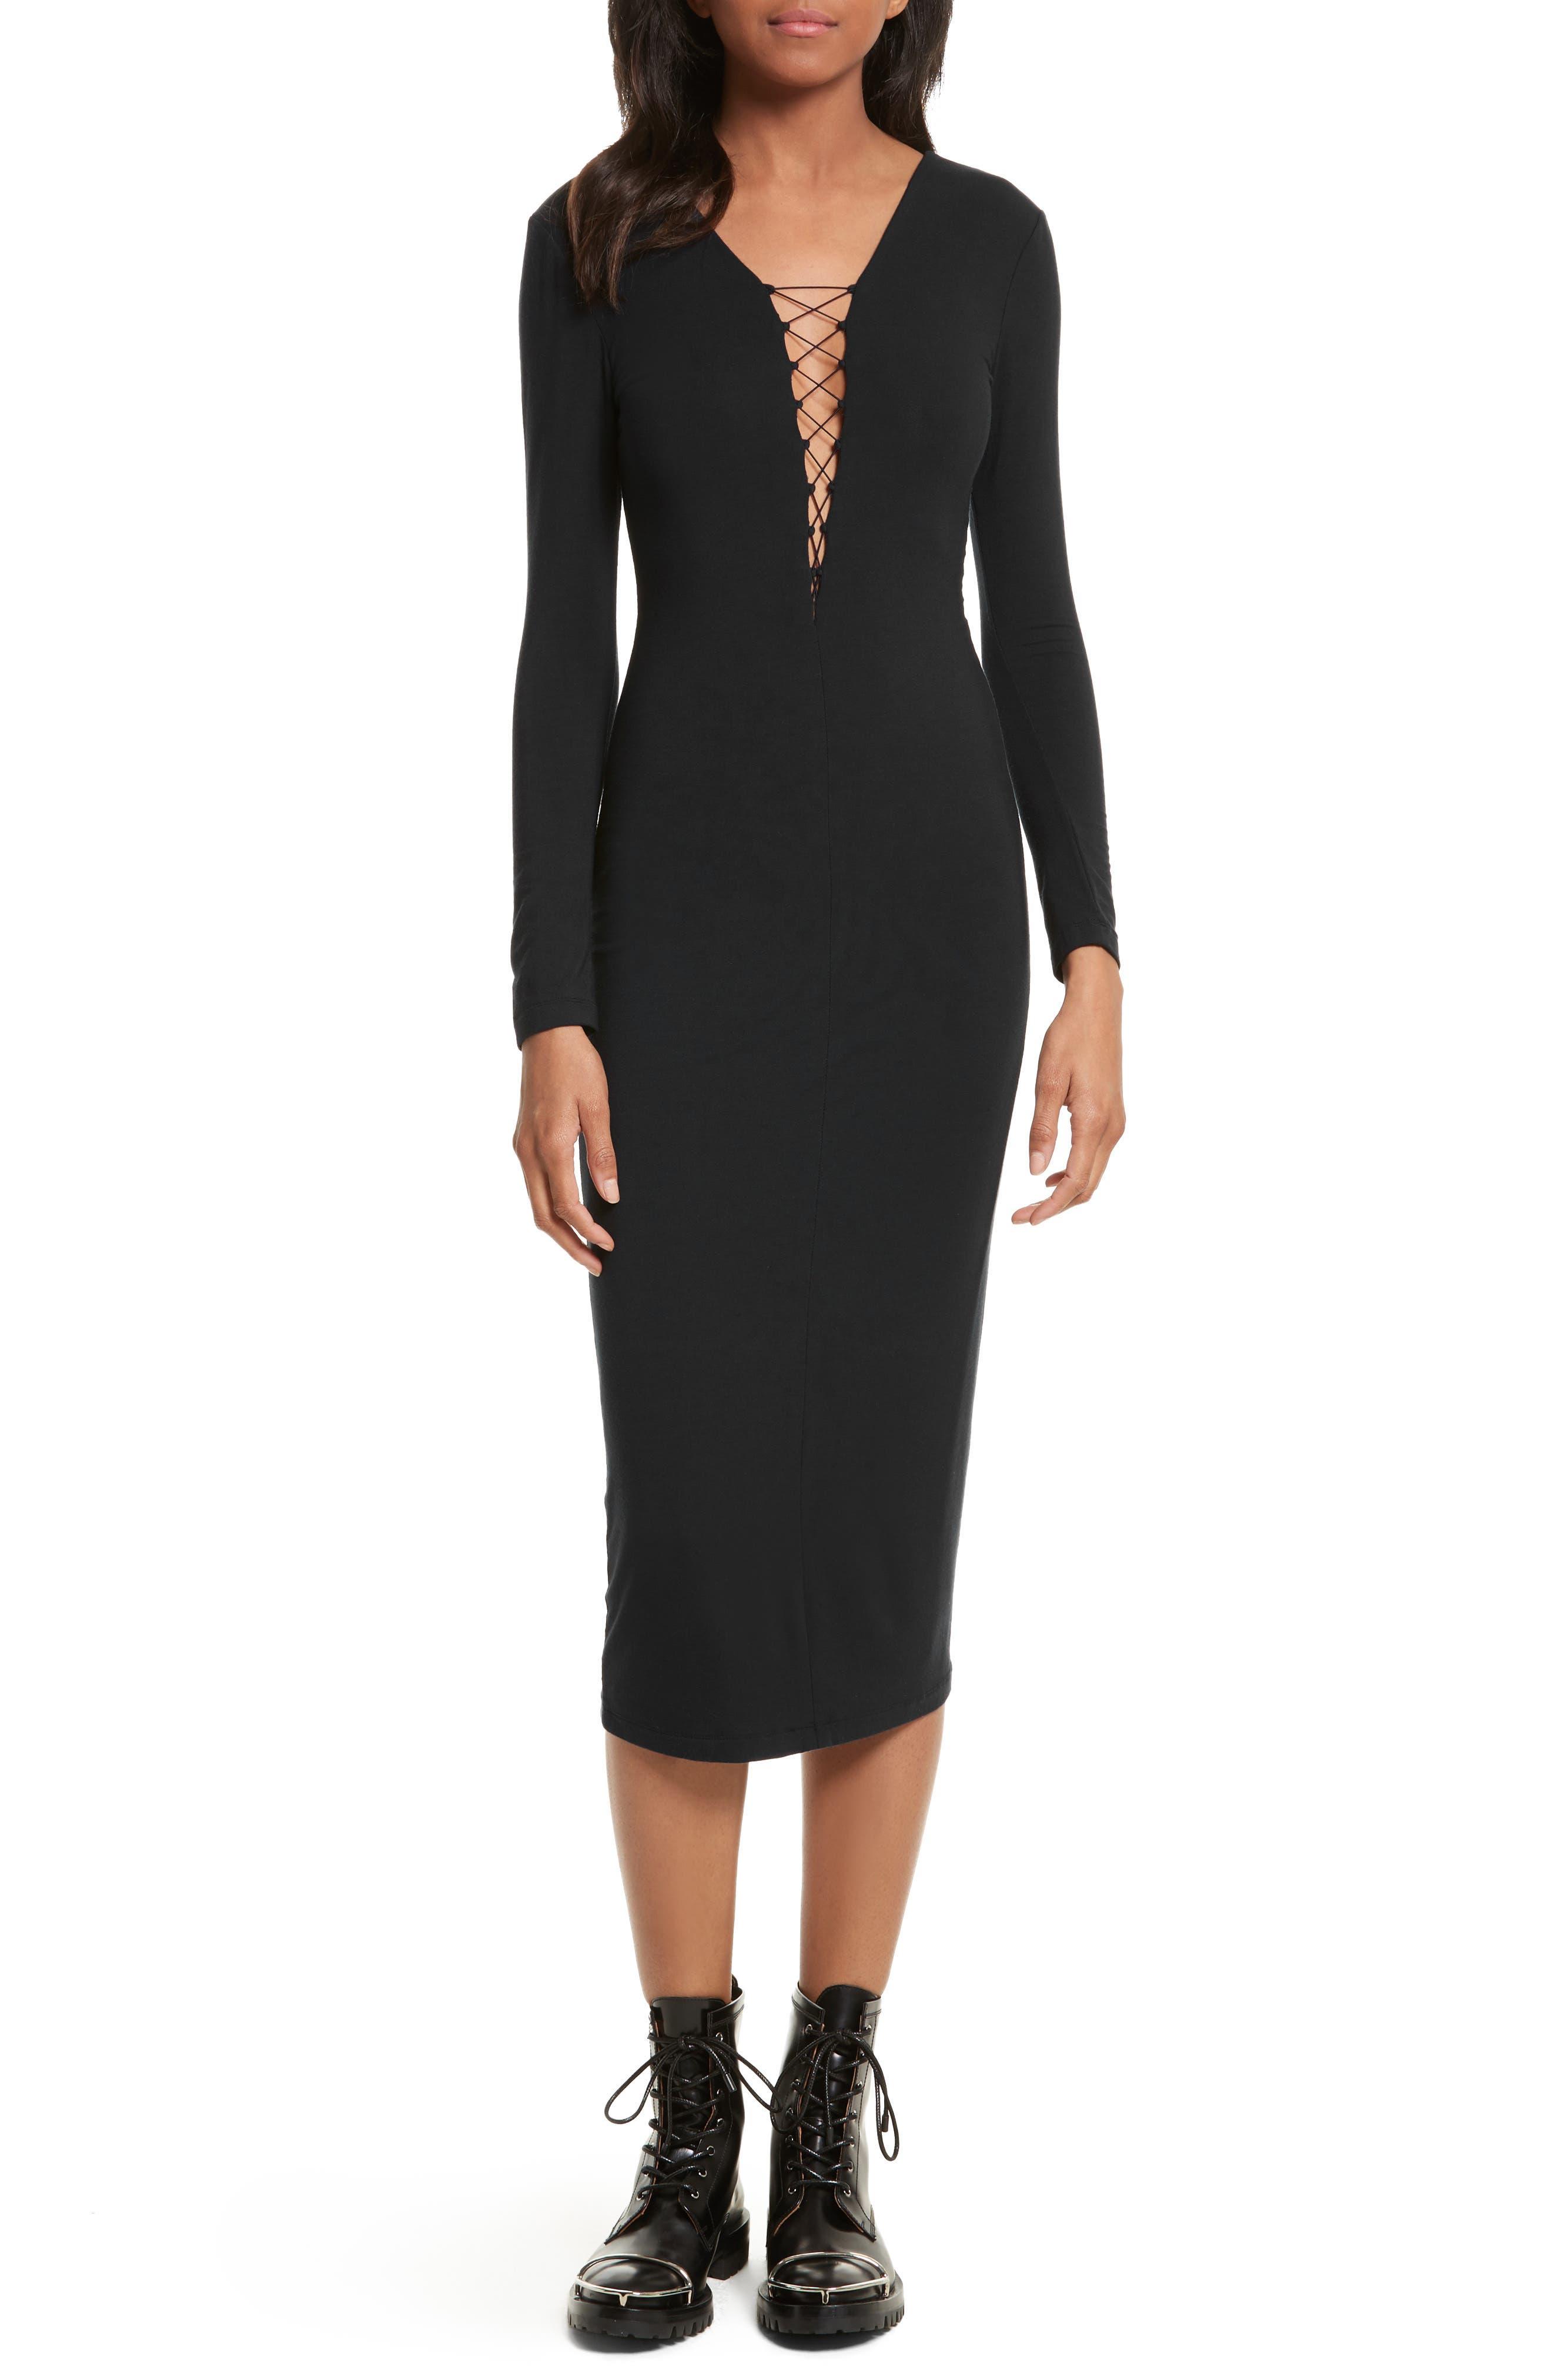 Main Image - T by Alexander Wang Lace-Up Stretch Jersey Midi Dress